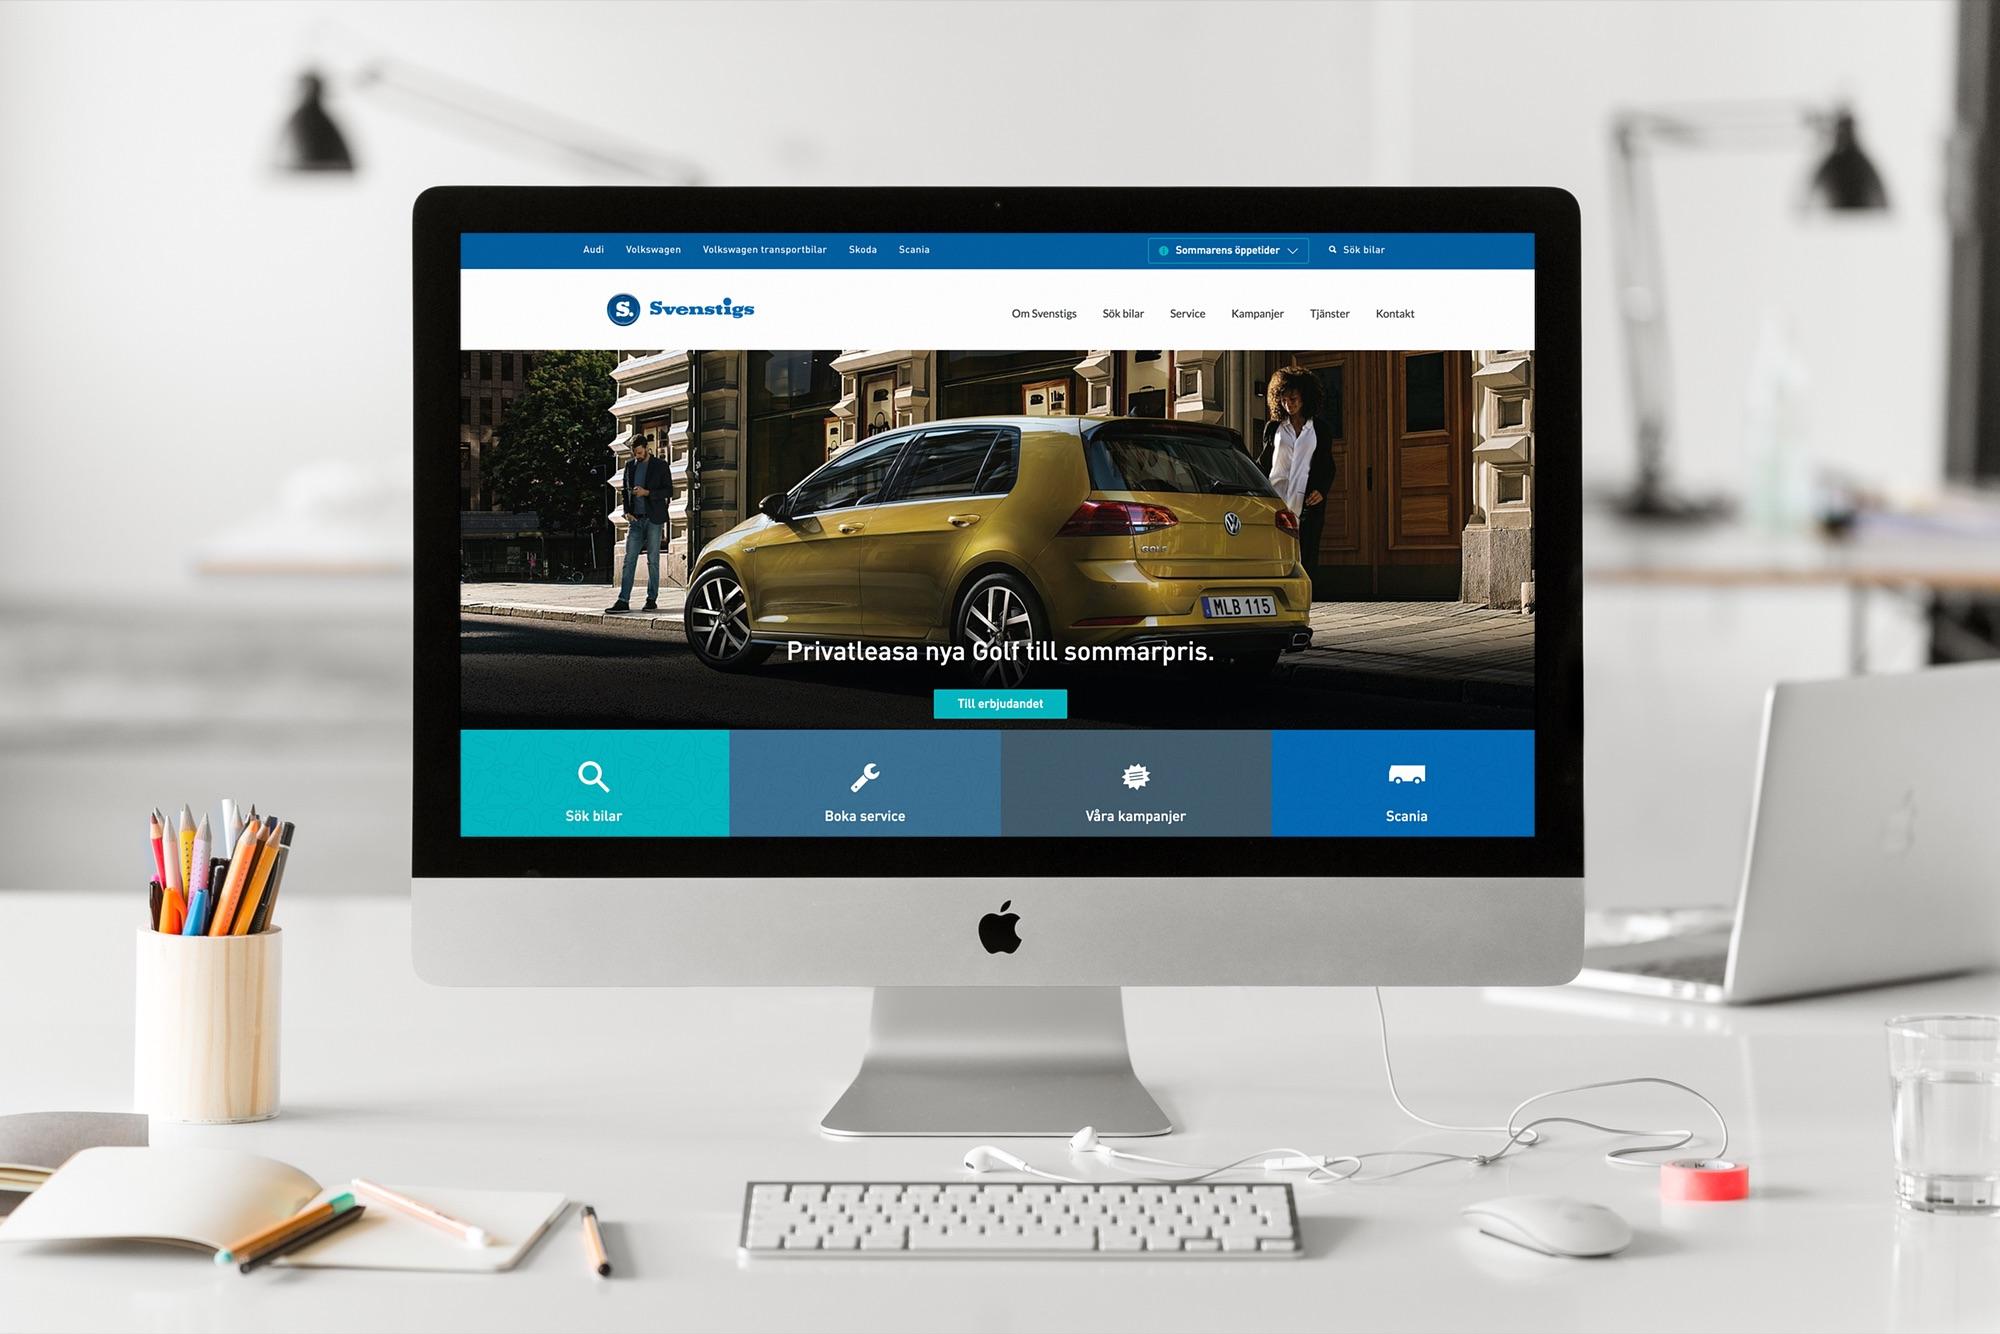 Svenstigs website